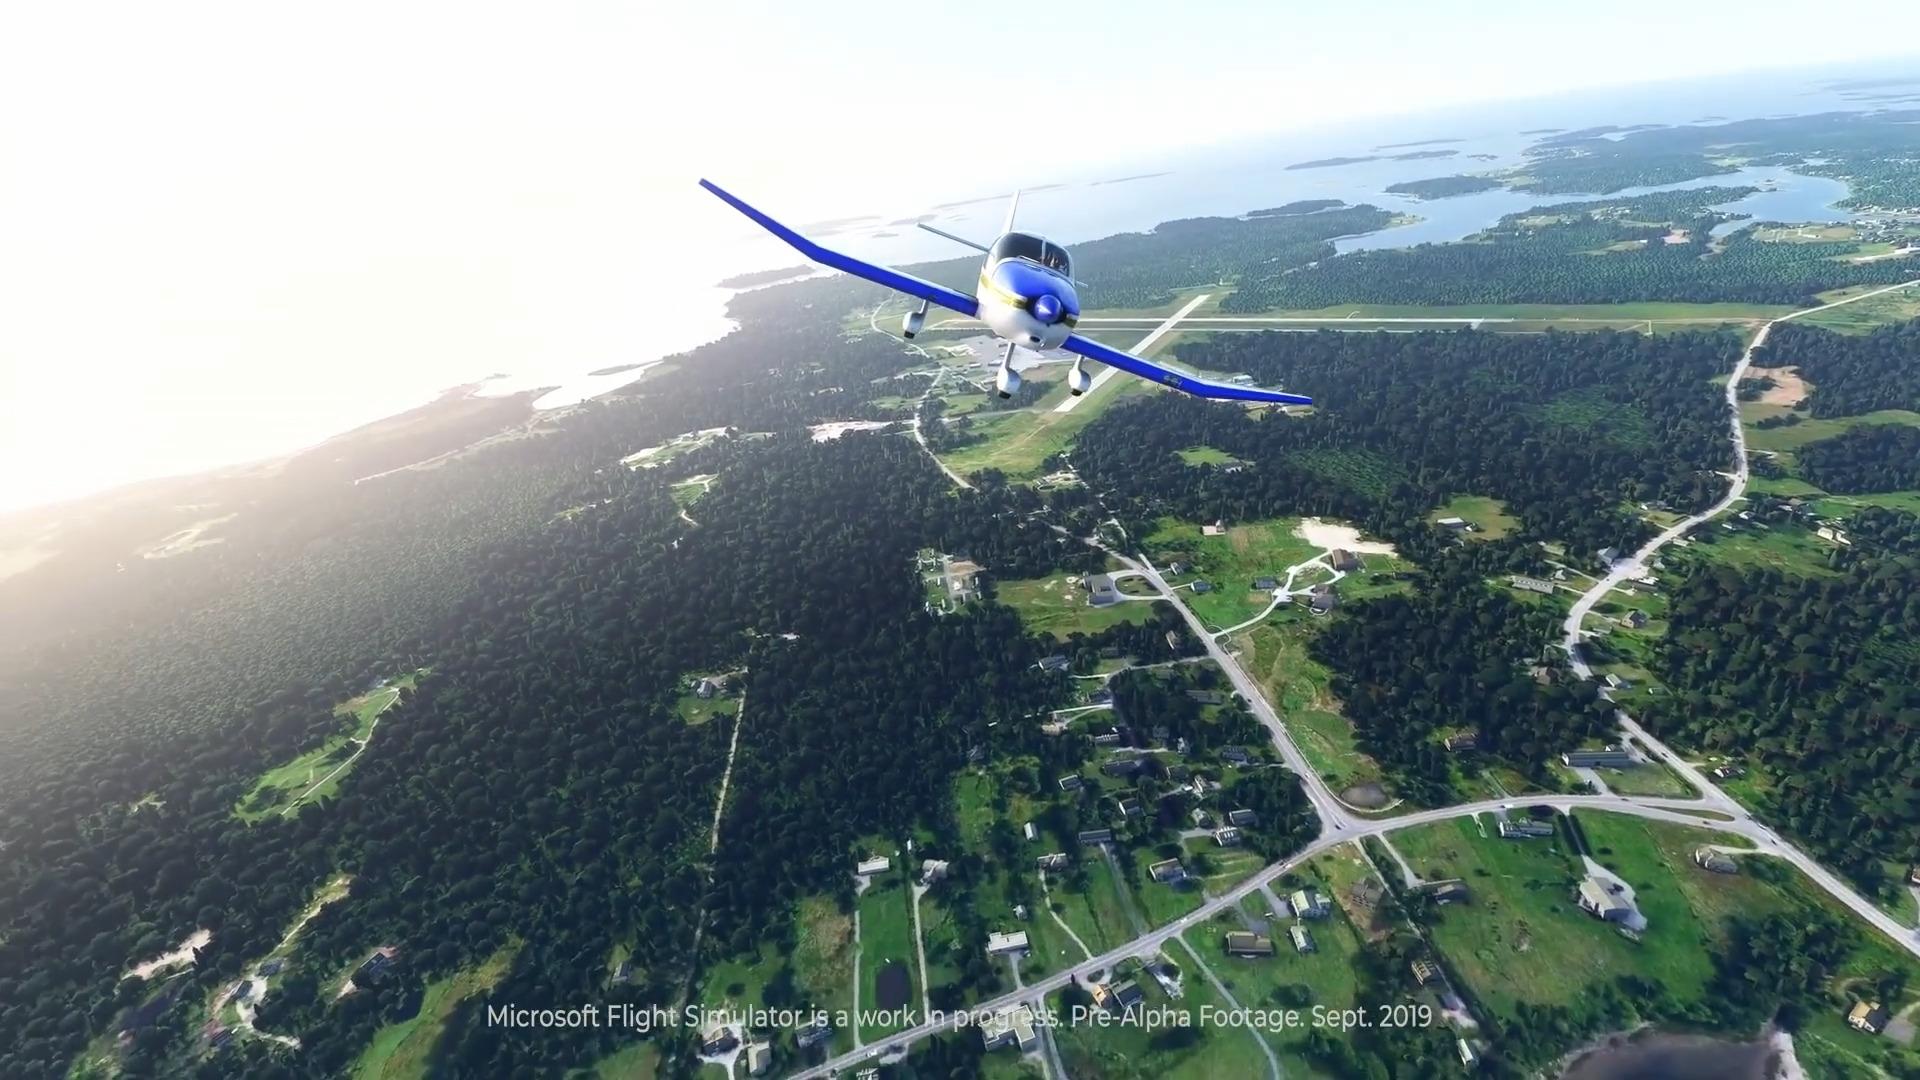 Microsoft-Flight-Simulator-2020-3.jpg